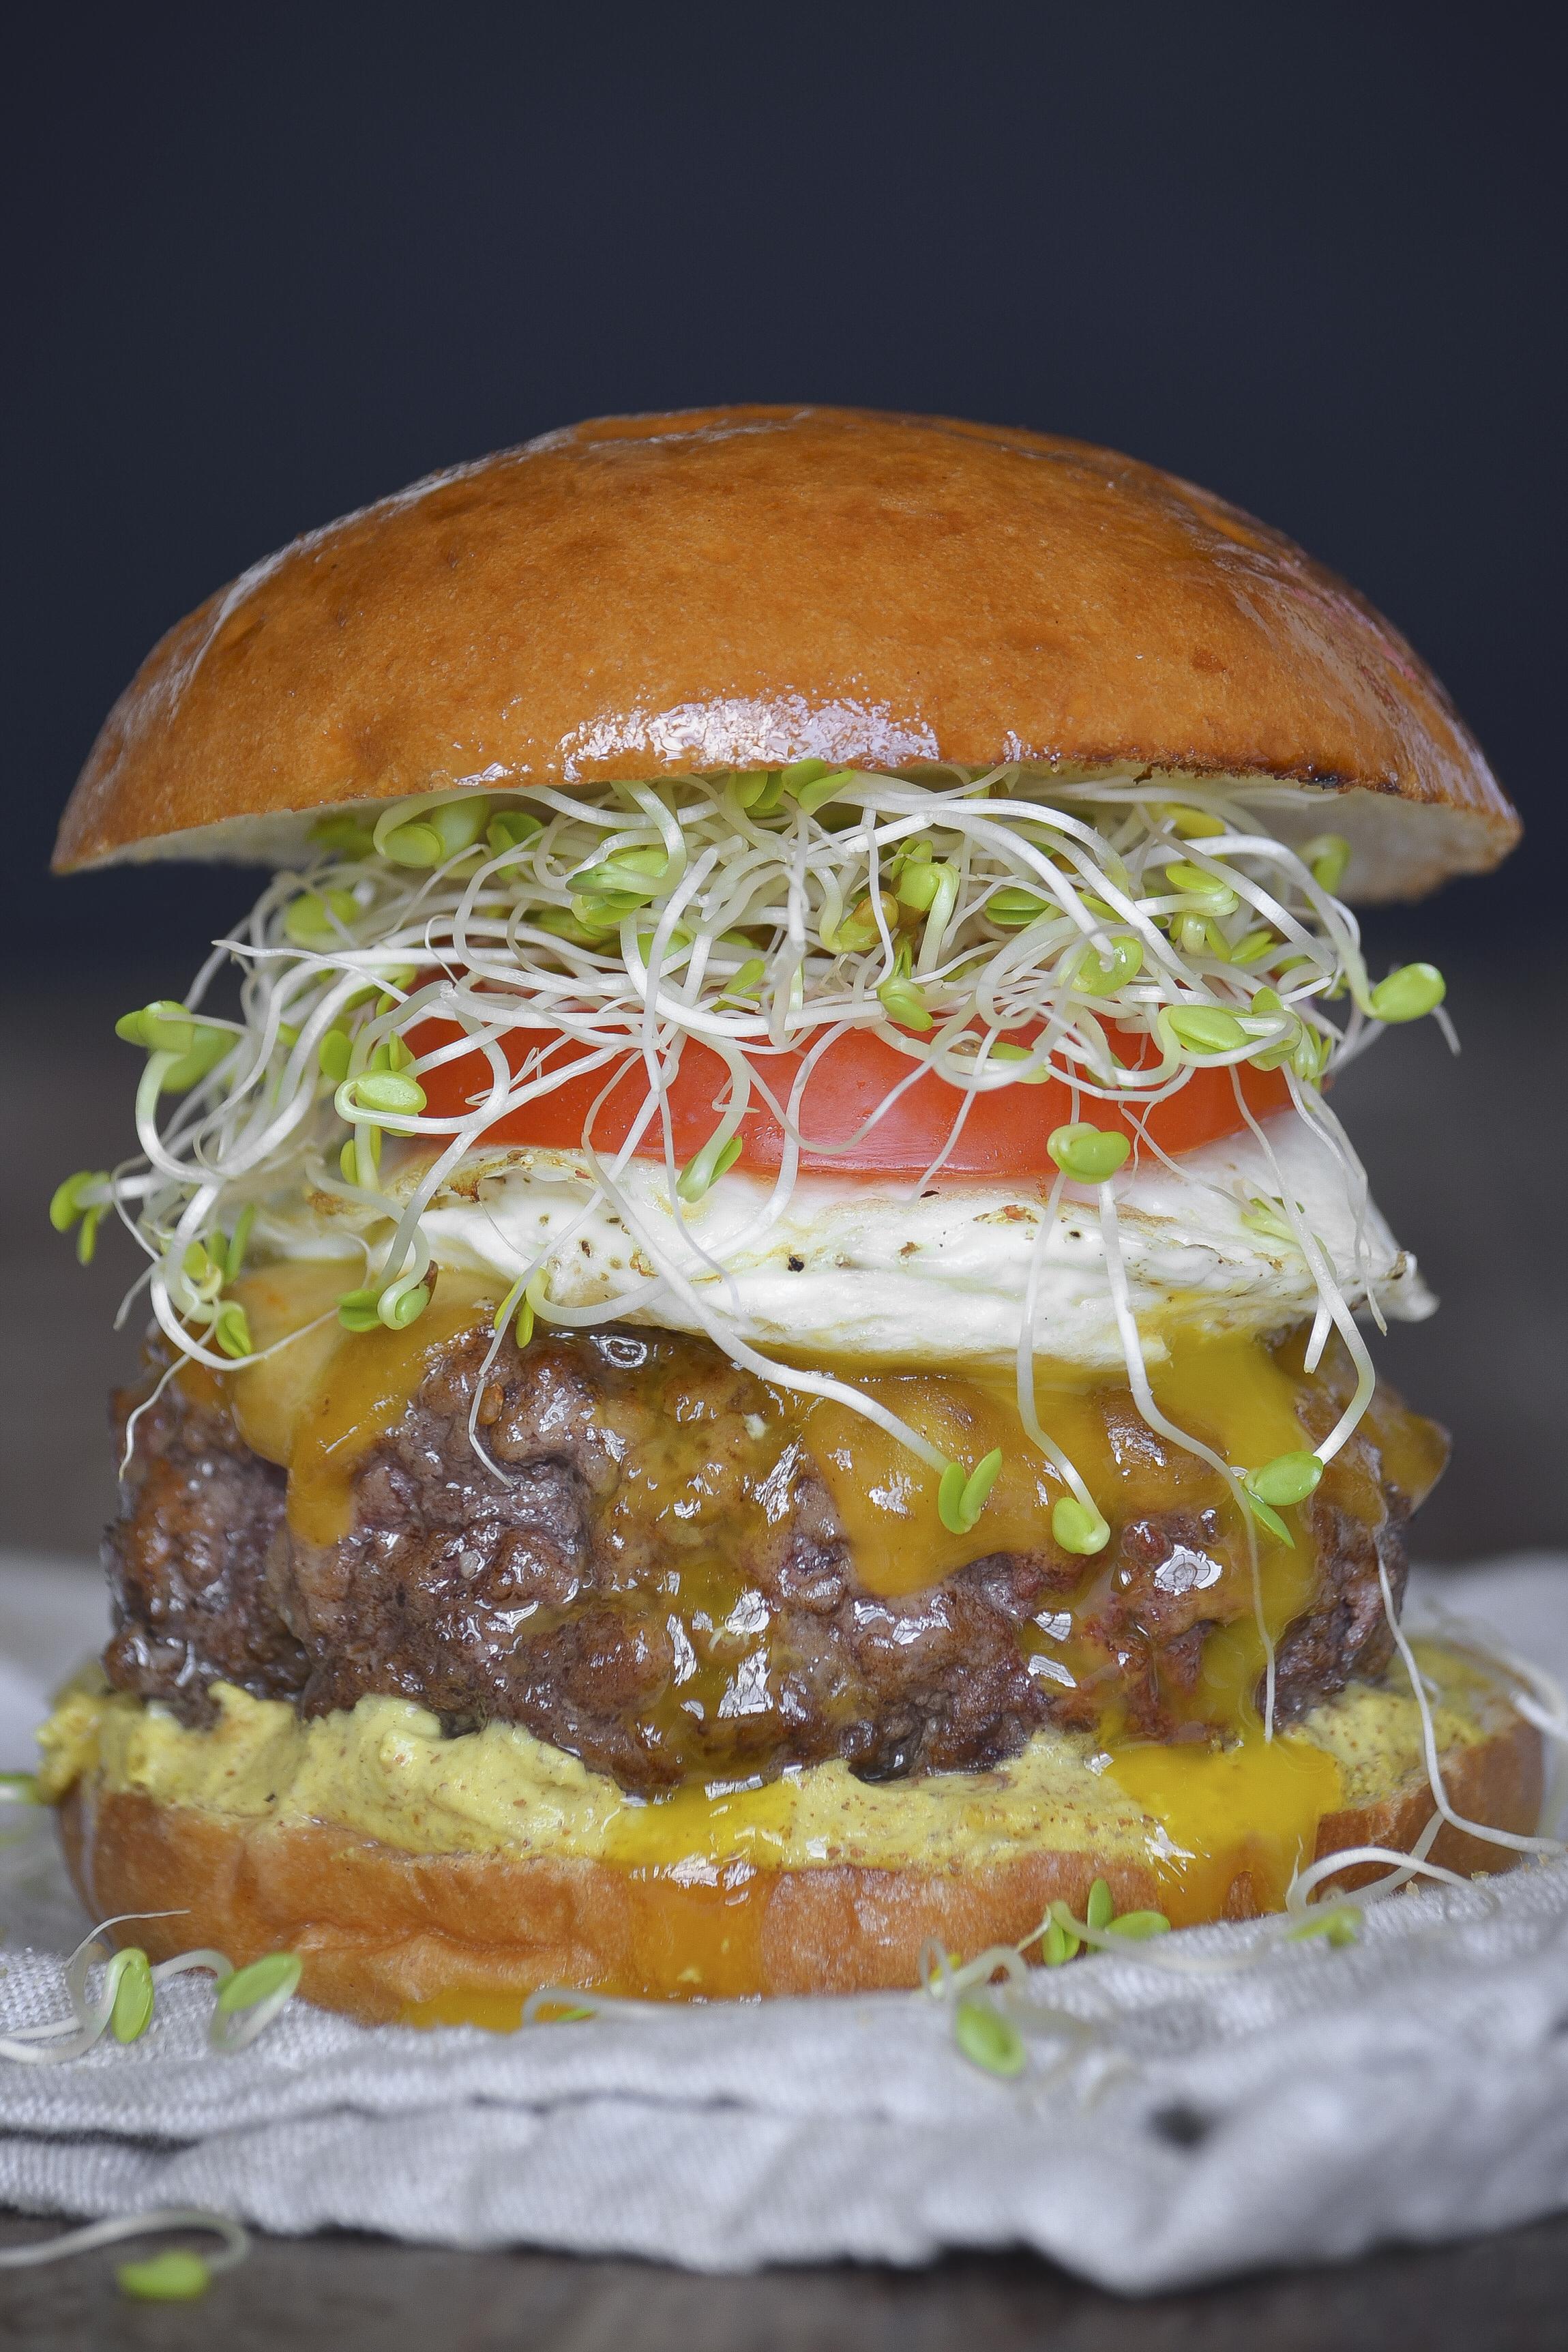 Eggburger.jpg